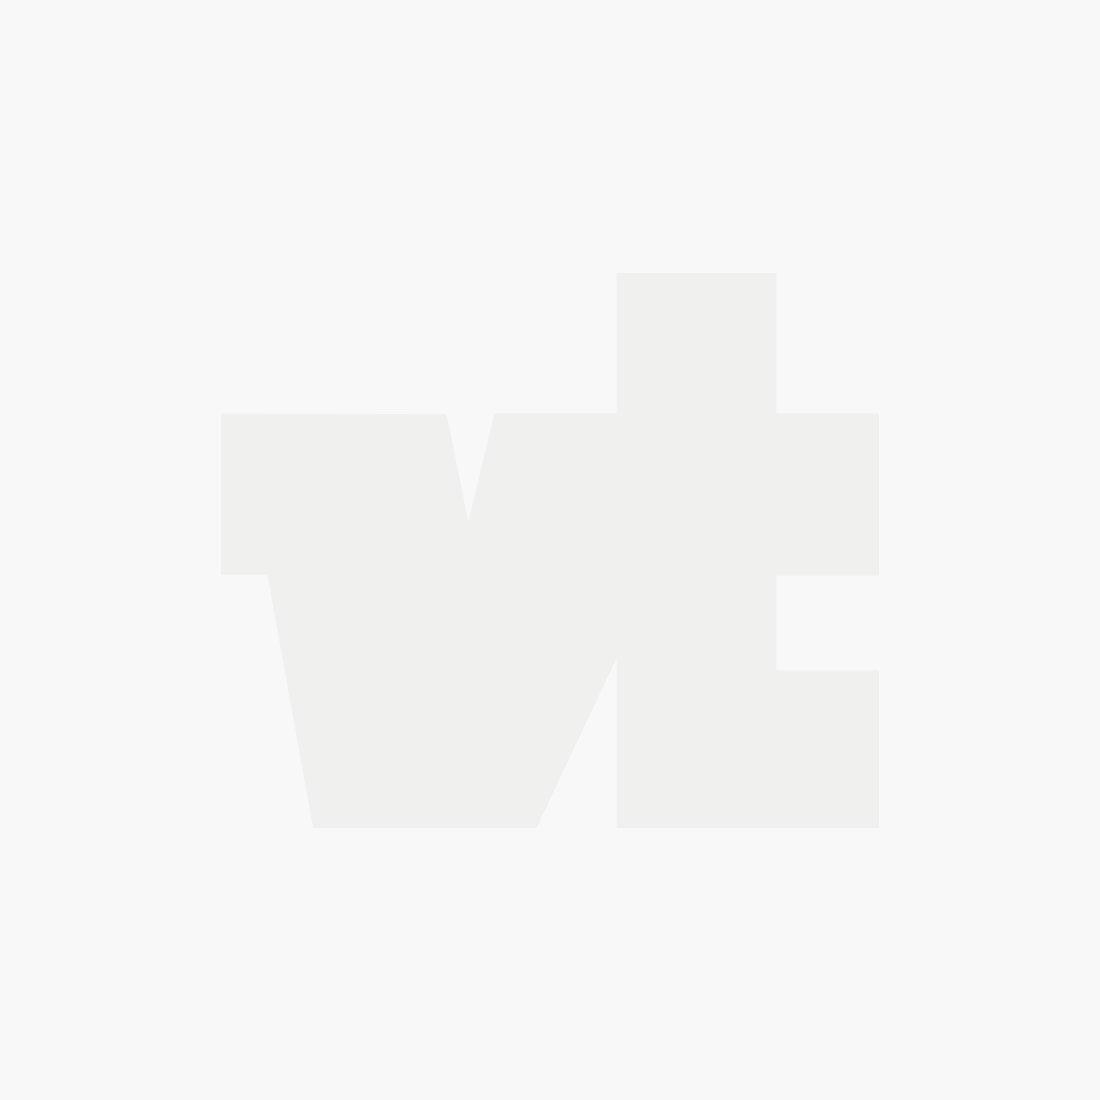 De Gipsy collectie bij VT Mode